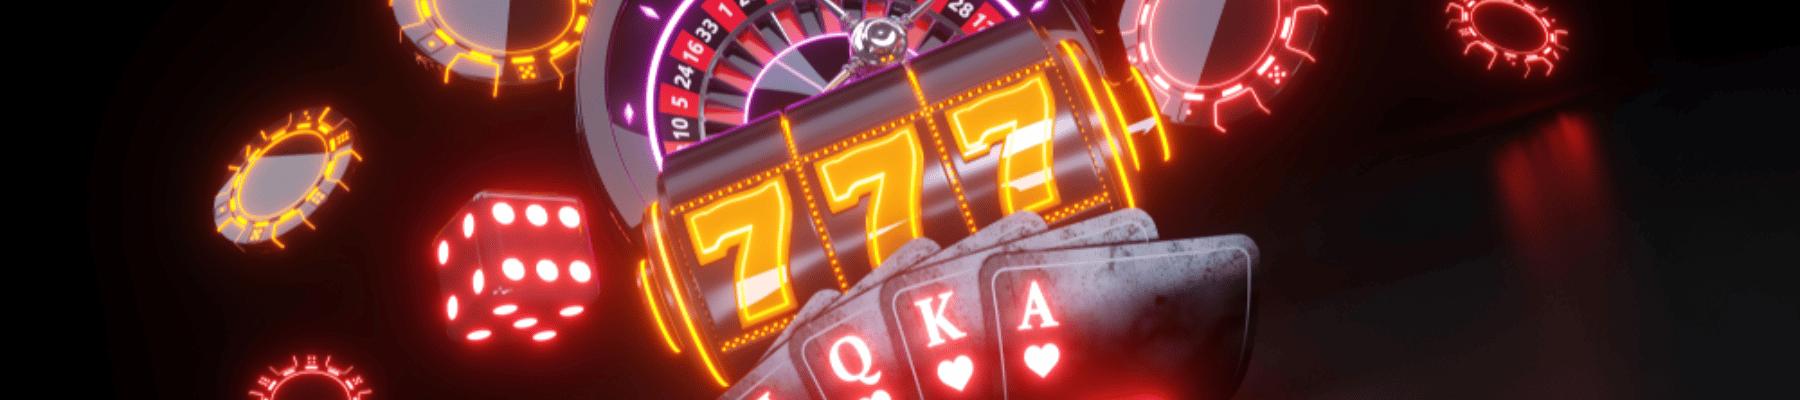 Casinoabnnmermainguide